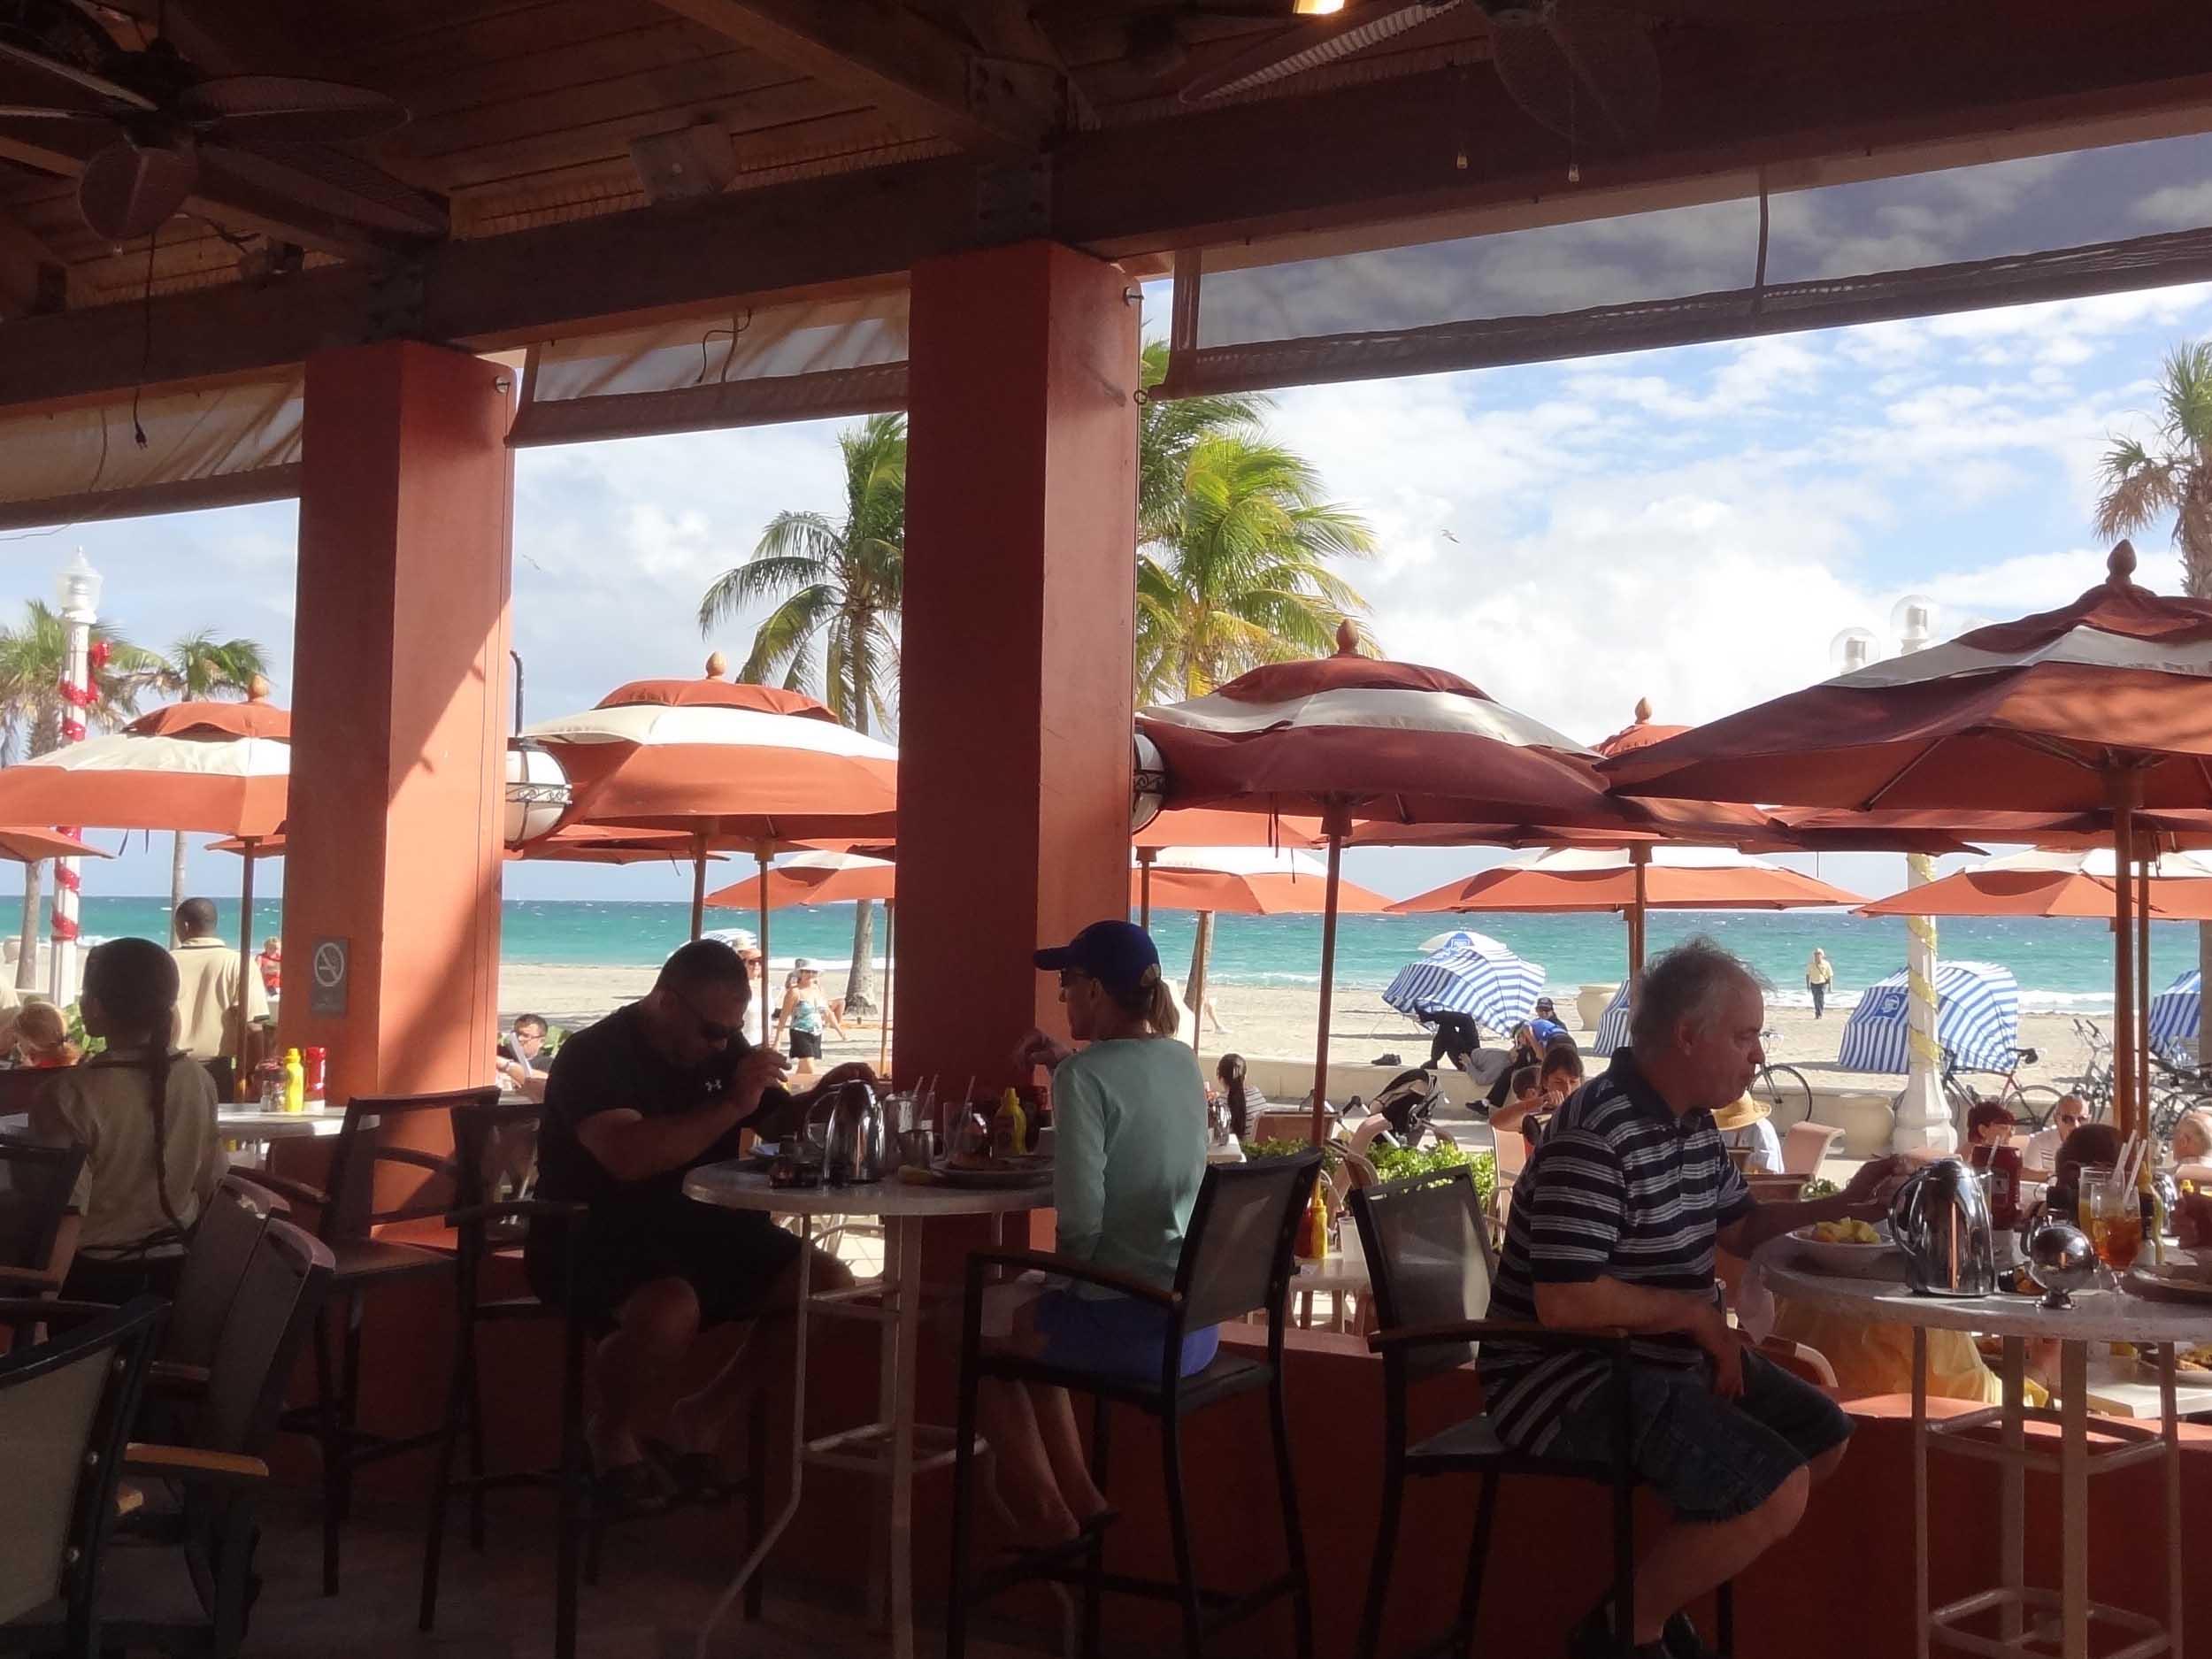 Latitudes Tiki Bar Indoor Dining Area and Beach View